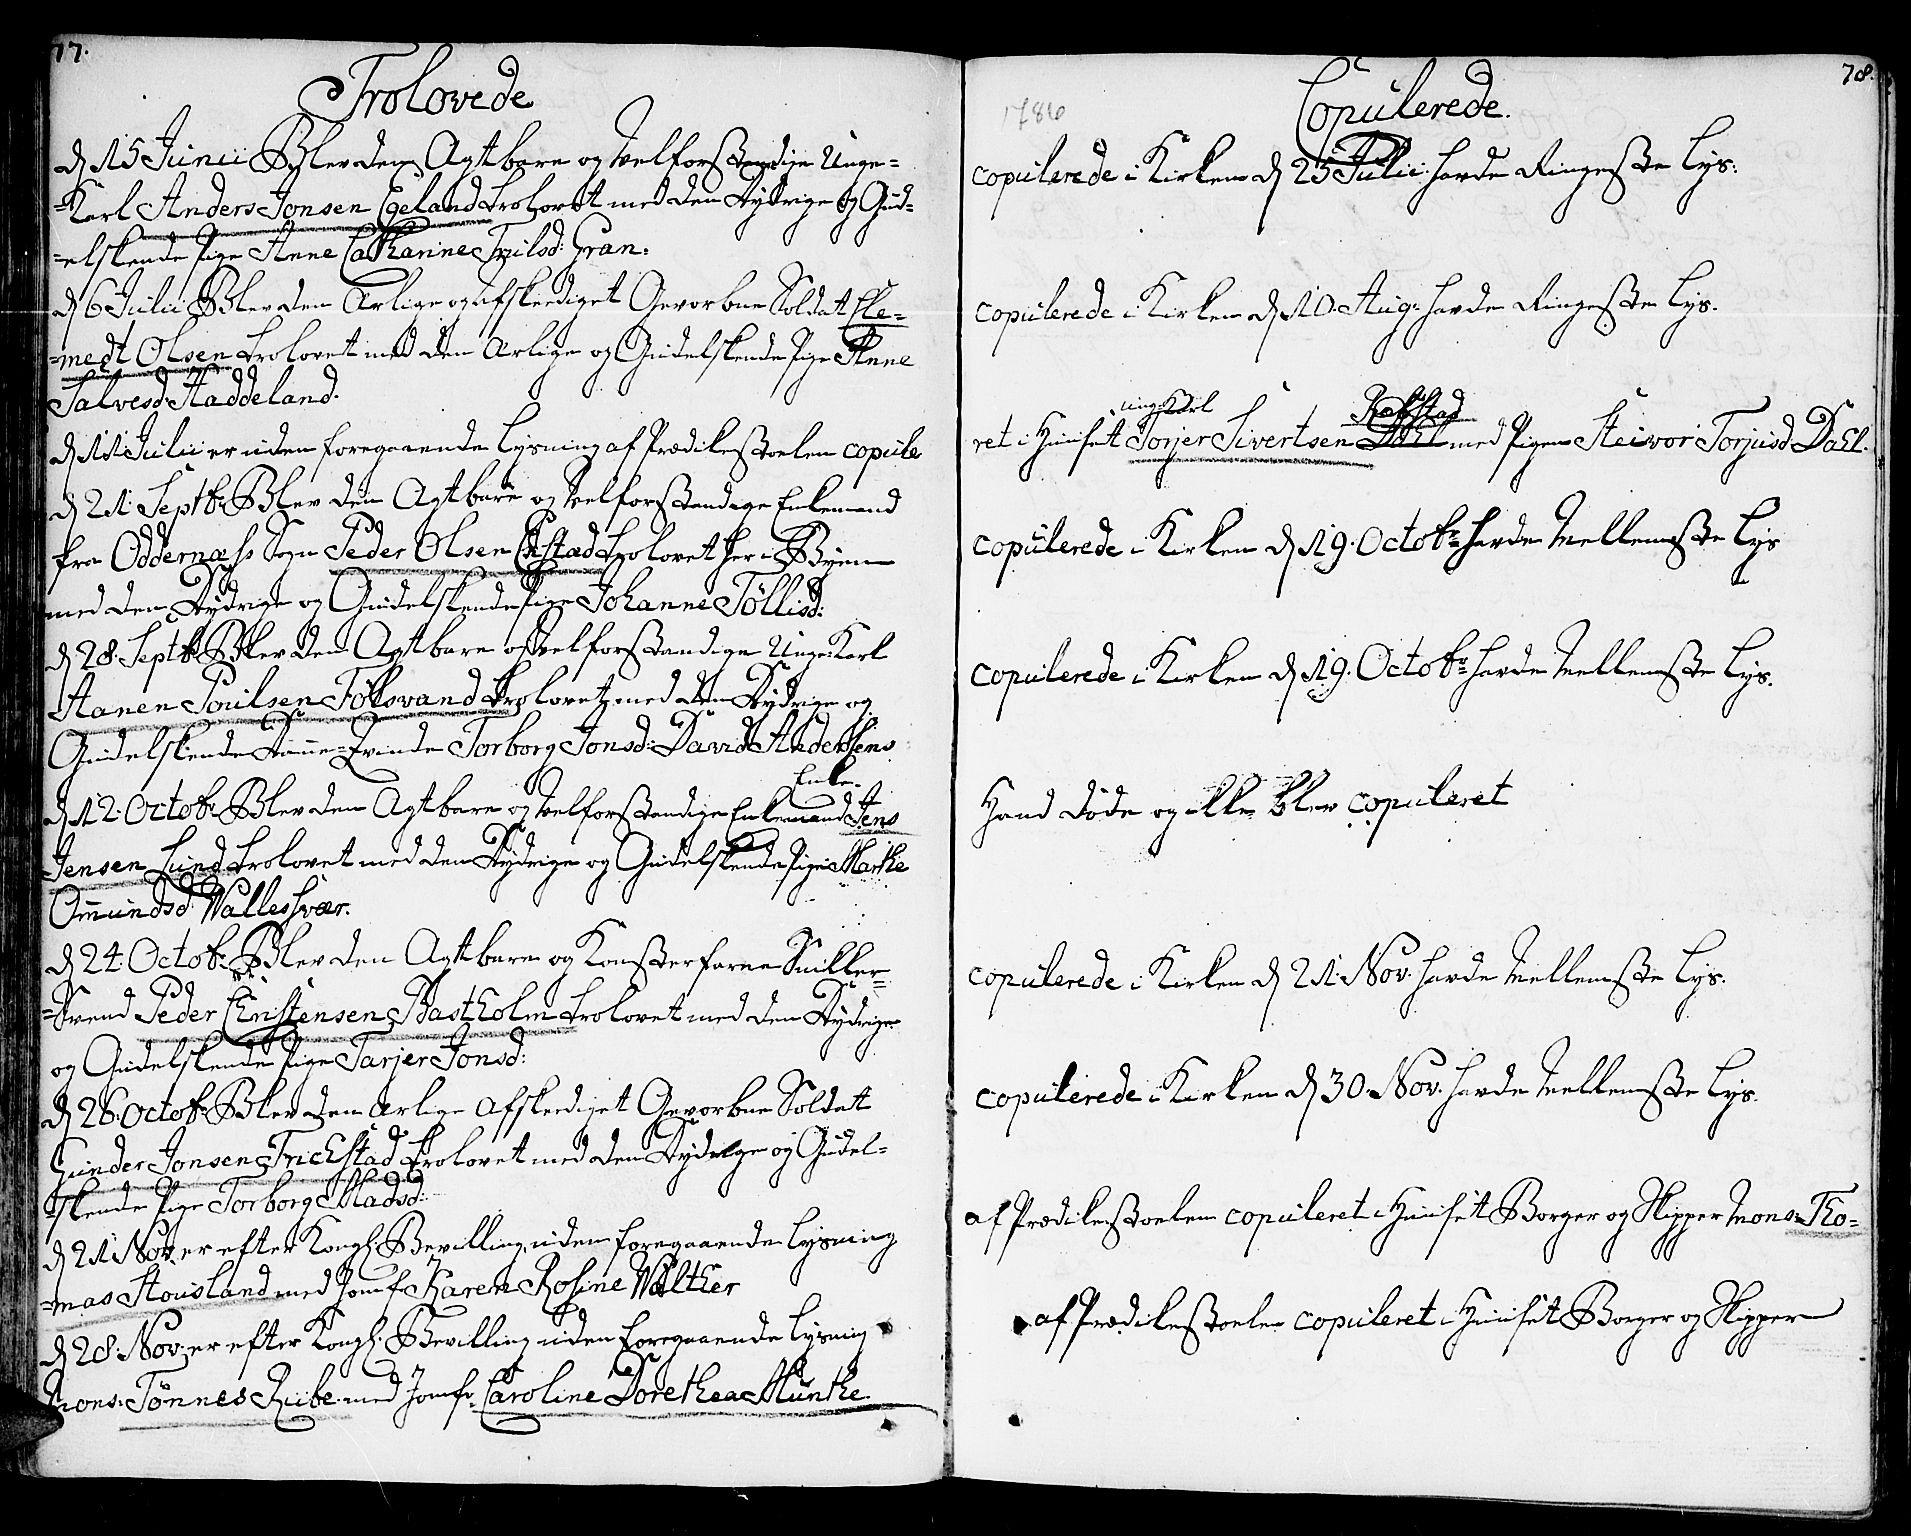 SAK, Kristiansand domprosti, F/Fa/L0005: Ministerialbok nr. A 5, 1776-1818, s. 77-78